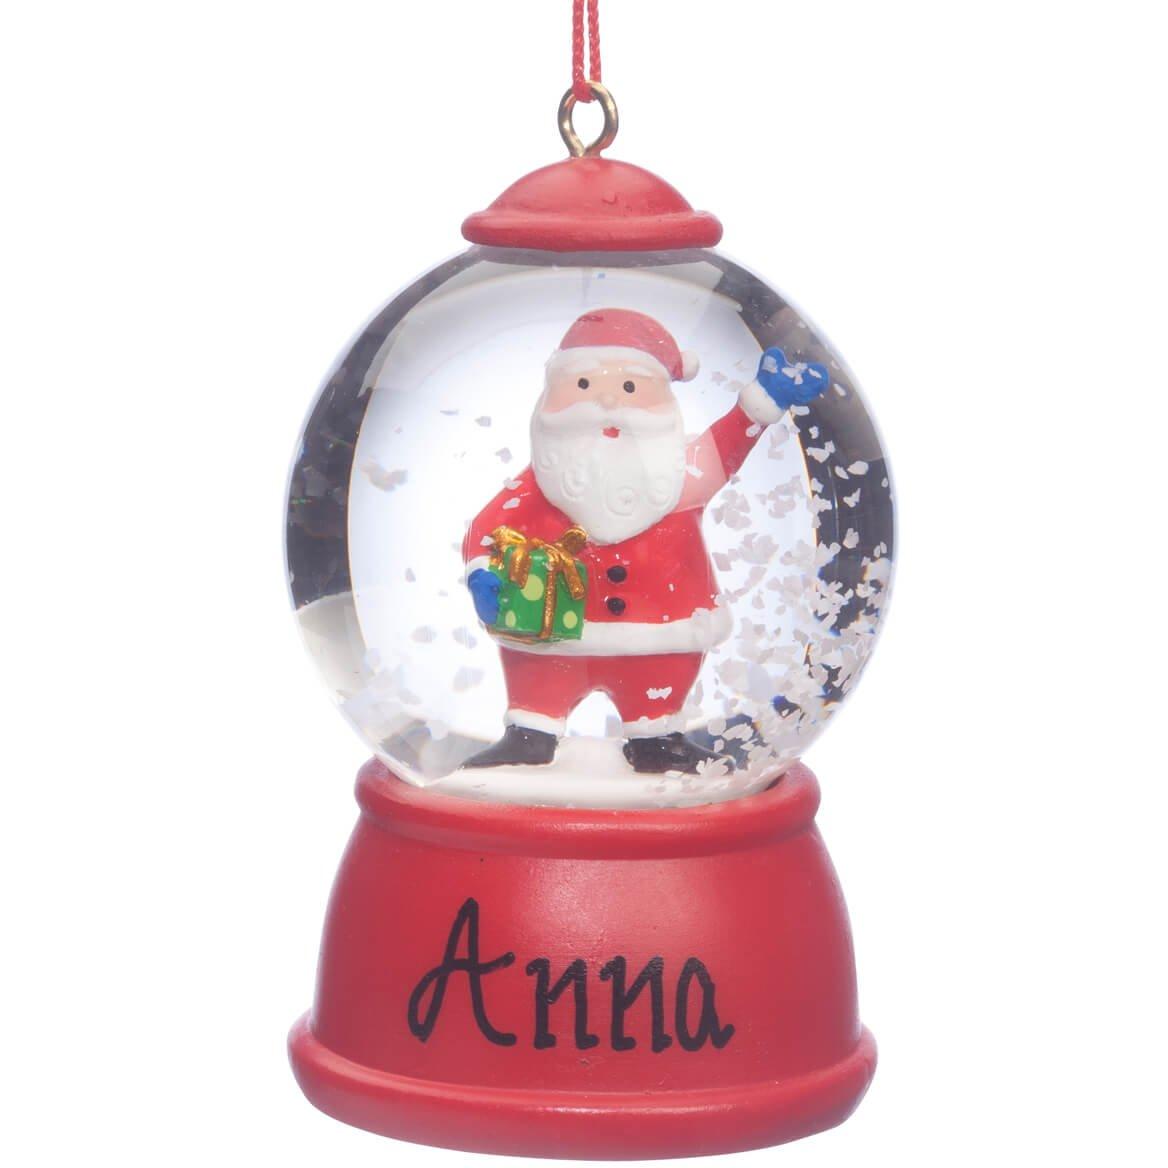 Miles Kimball Personalized Santa Waterglobe Ornament